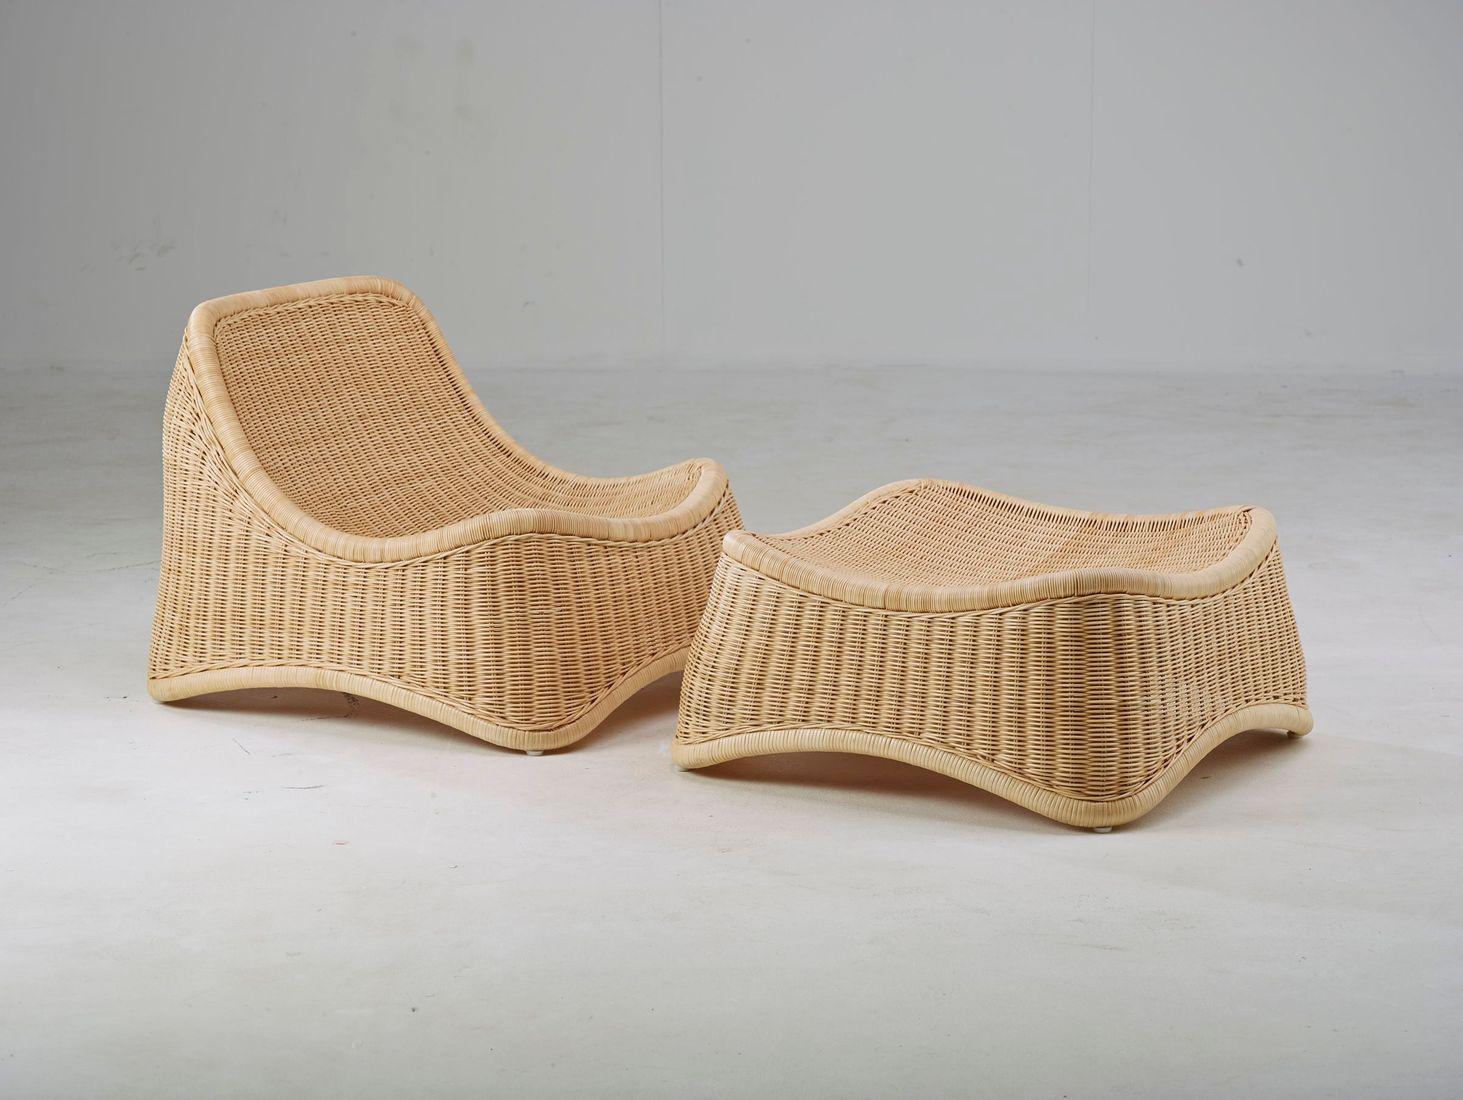 sika design outdoor rattan sessel chill mit hocker. Black Bedroom Furniture Sets. Home Design Ideas